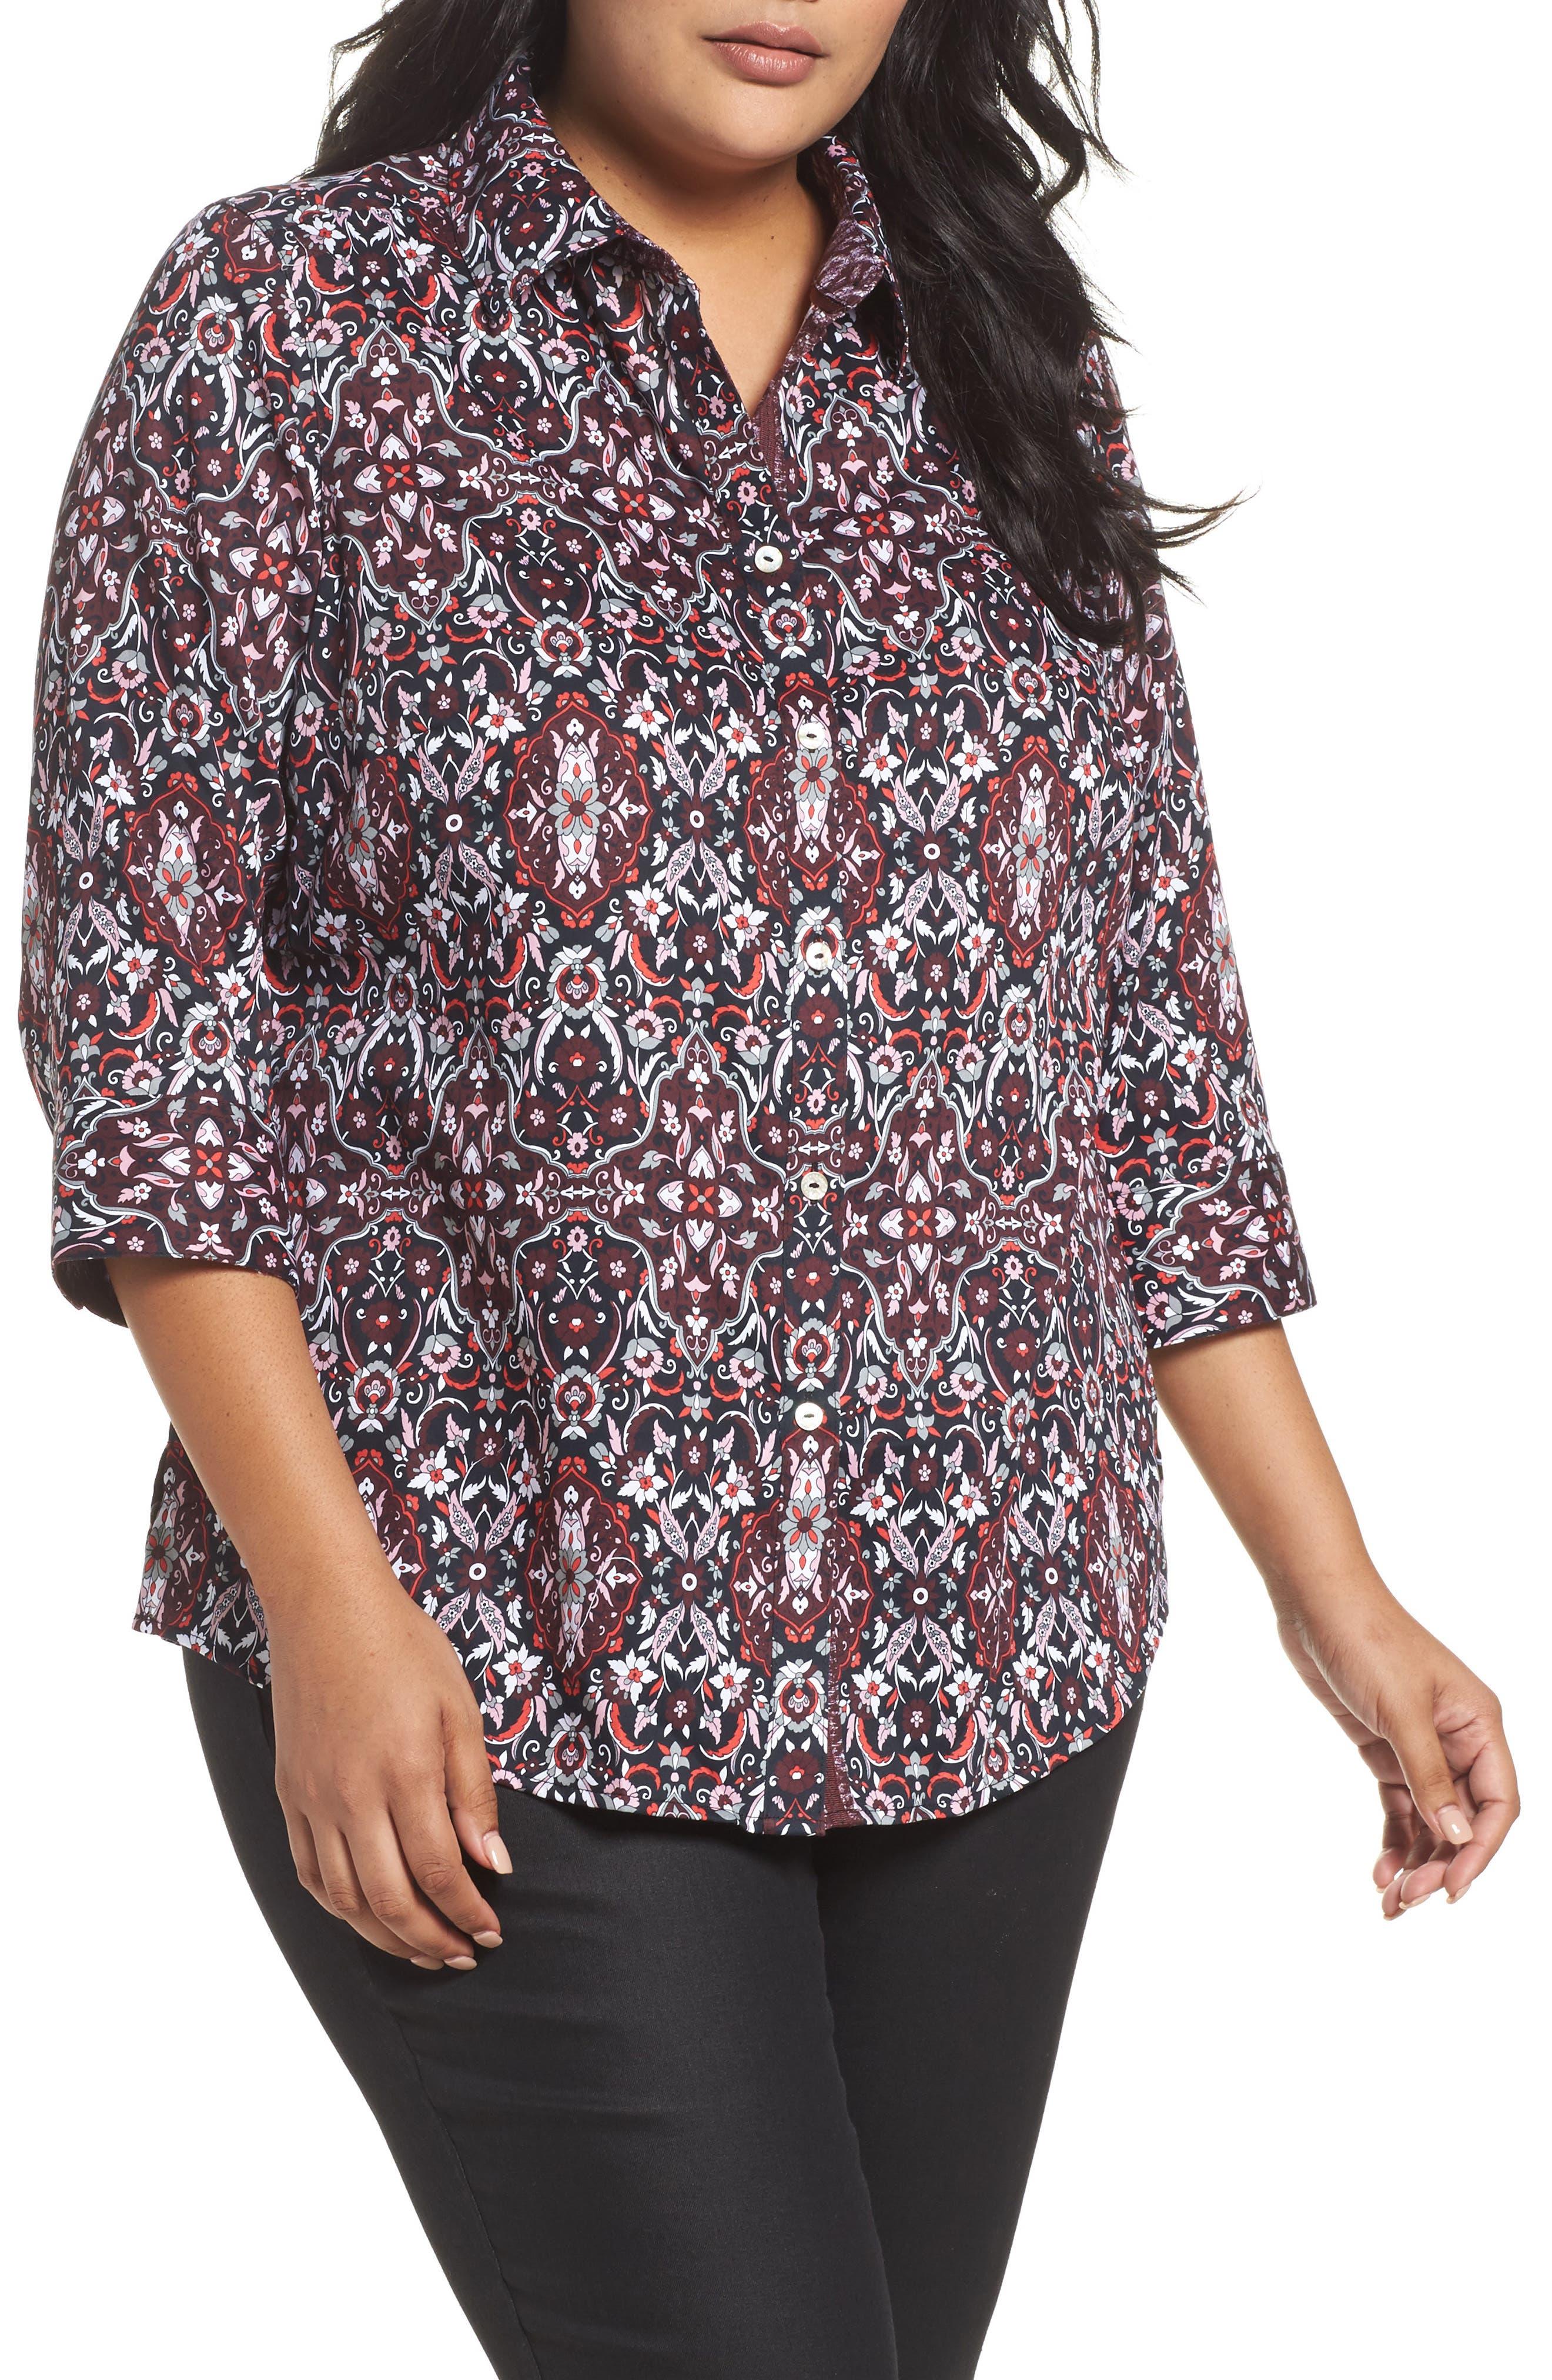 Main Image - Foxcroft Ava Heirloom Paisley Print Cotton Shirt (Plus Size)